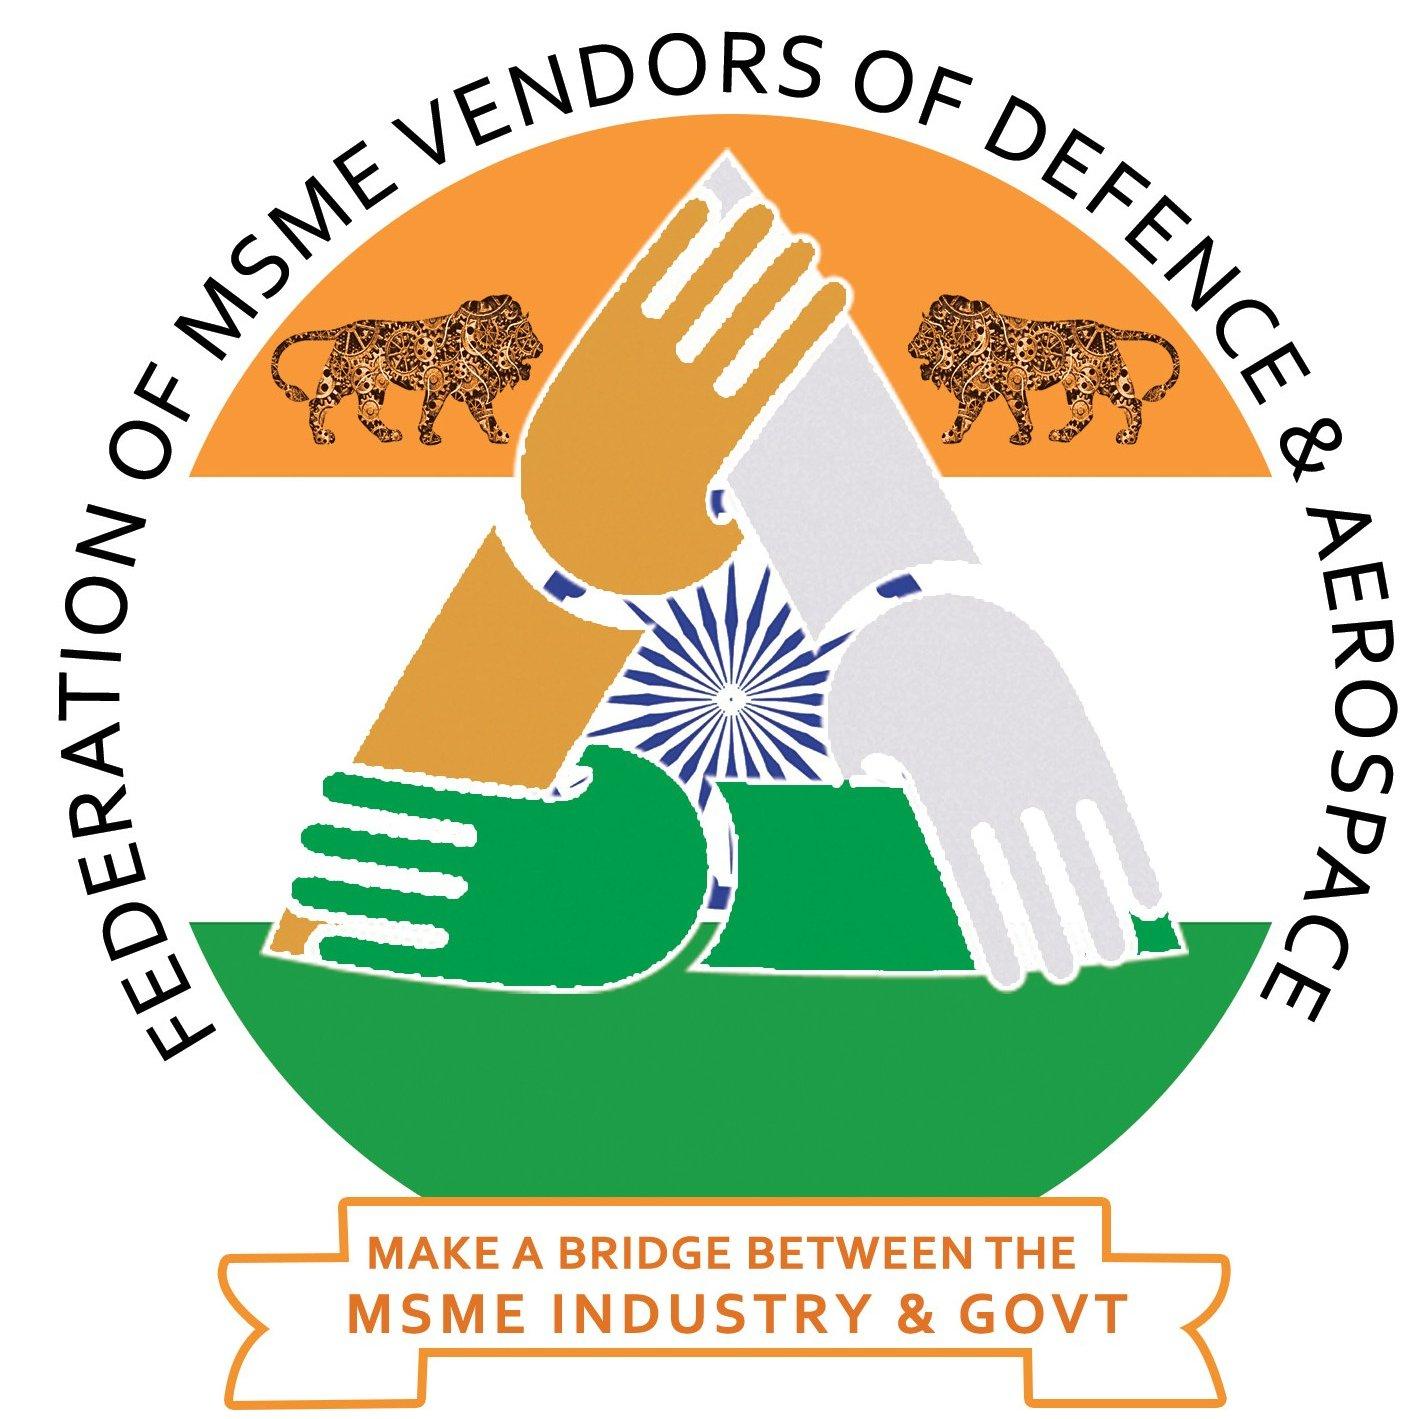 Msme logo clipart image royalty free Federation of MSME Vendors of Defence & Aerospace (@fedmsmevoda ... image royalty free